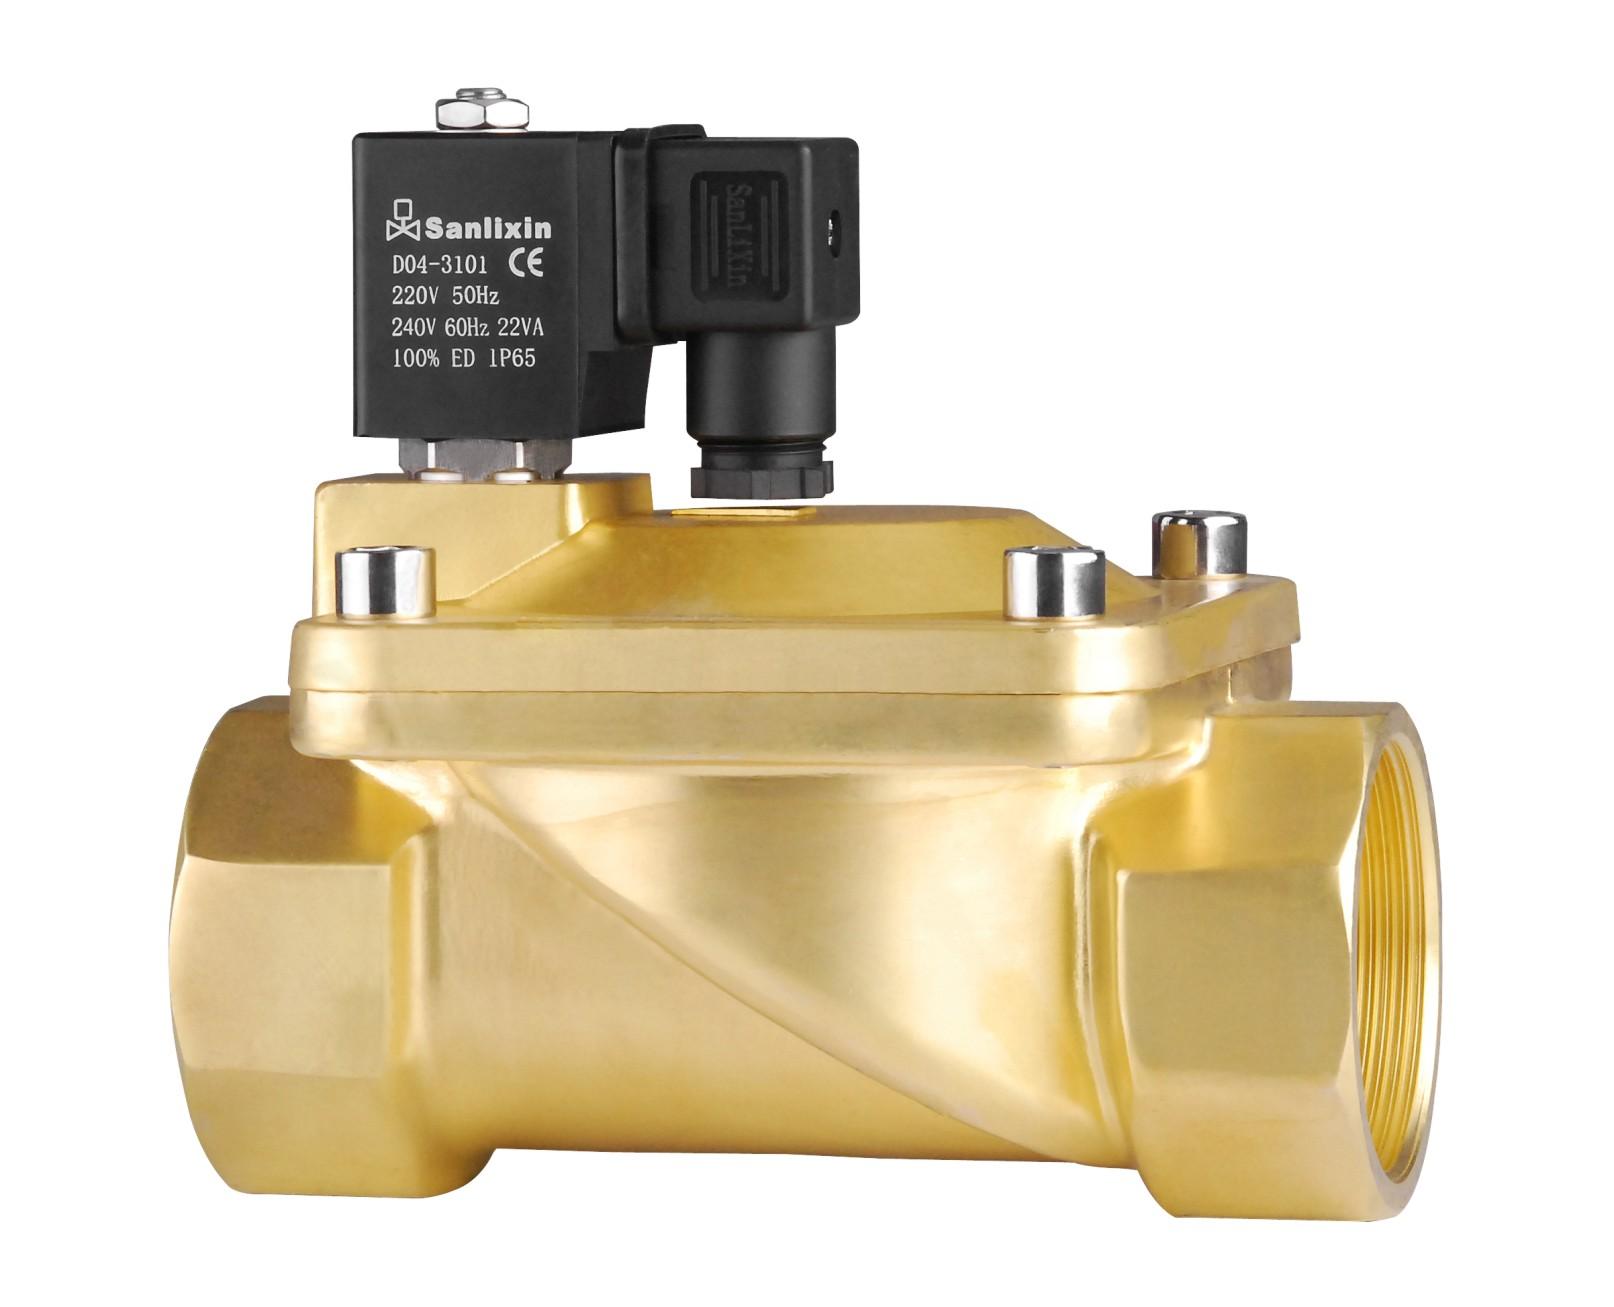 slp-40系列水液气油电磁阀_水处理专用电磁阀_淄博厂家直销图片